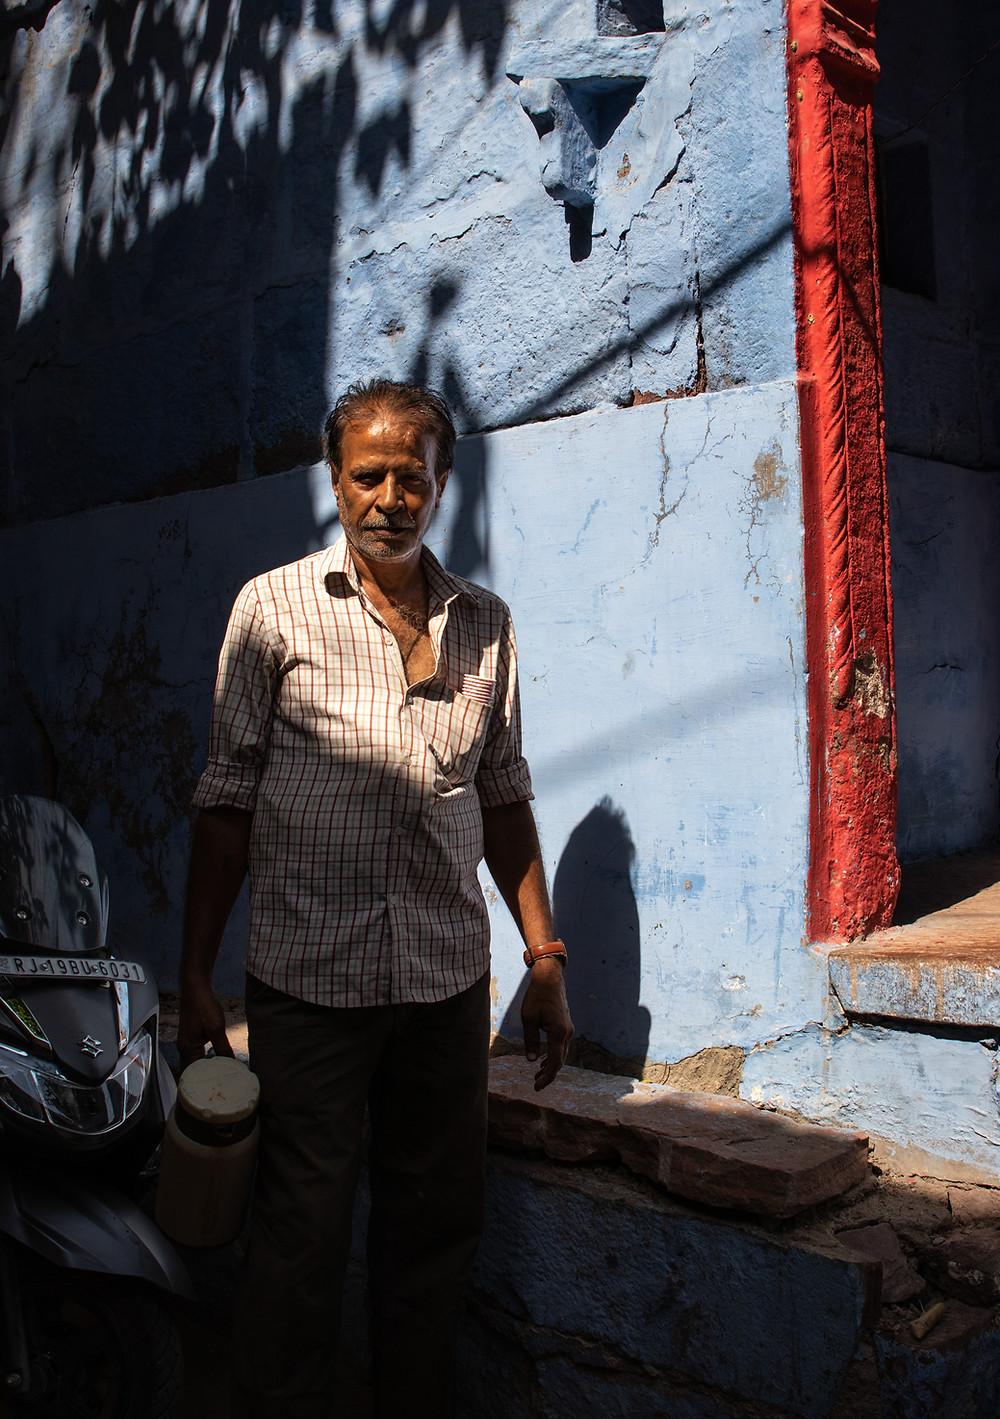 chai vendor in the streets of Jodhpur